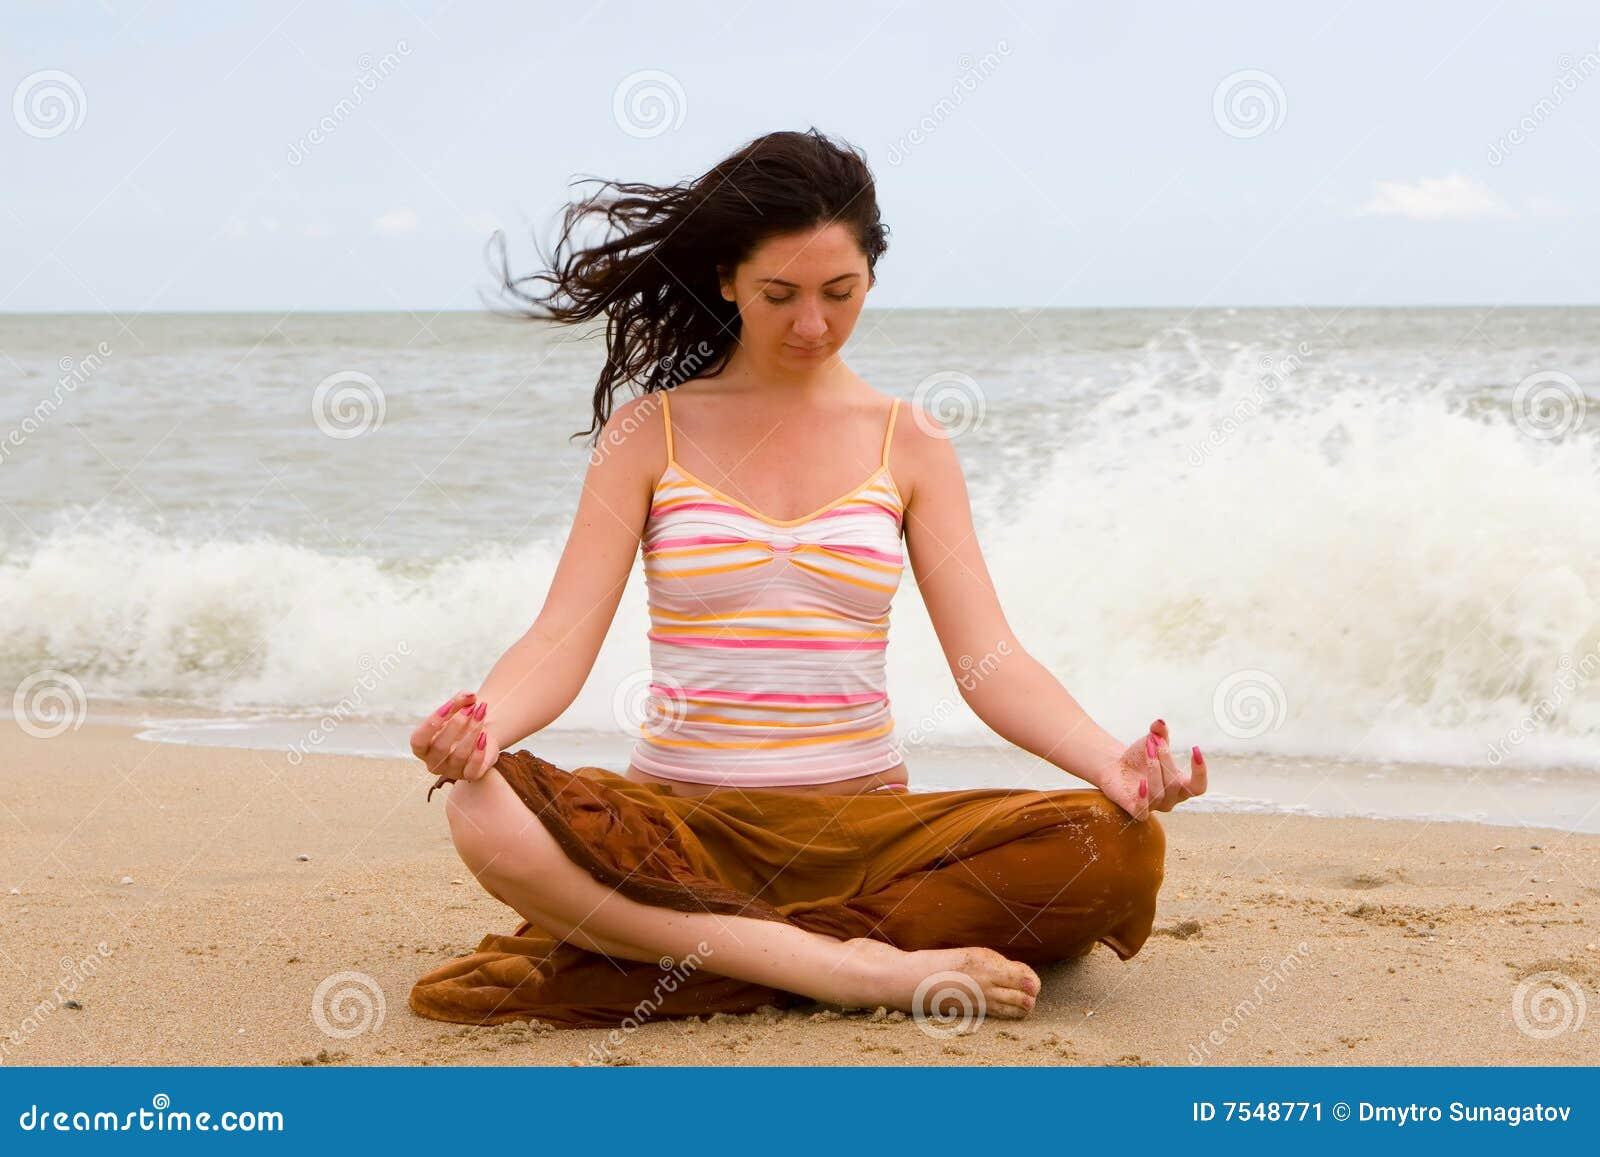 Girl meditation in beach